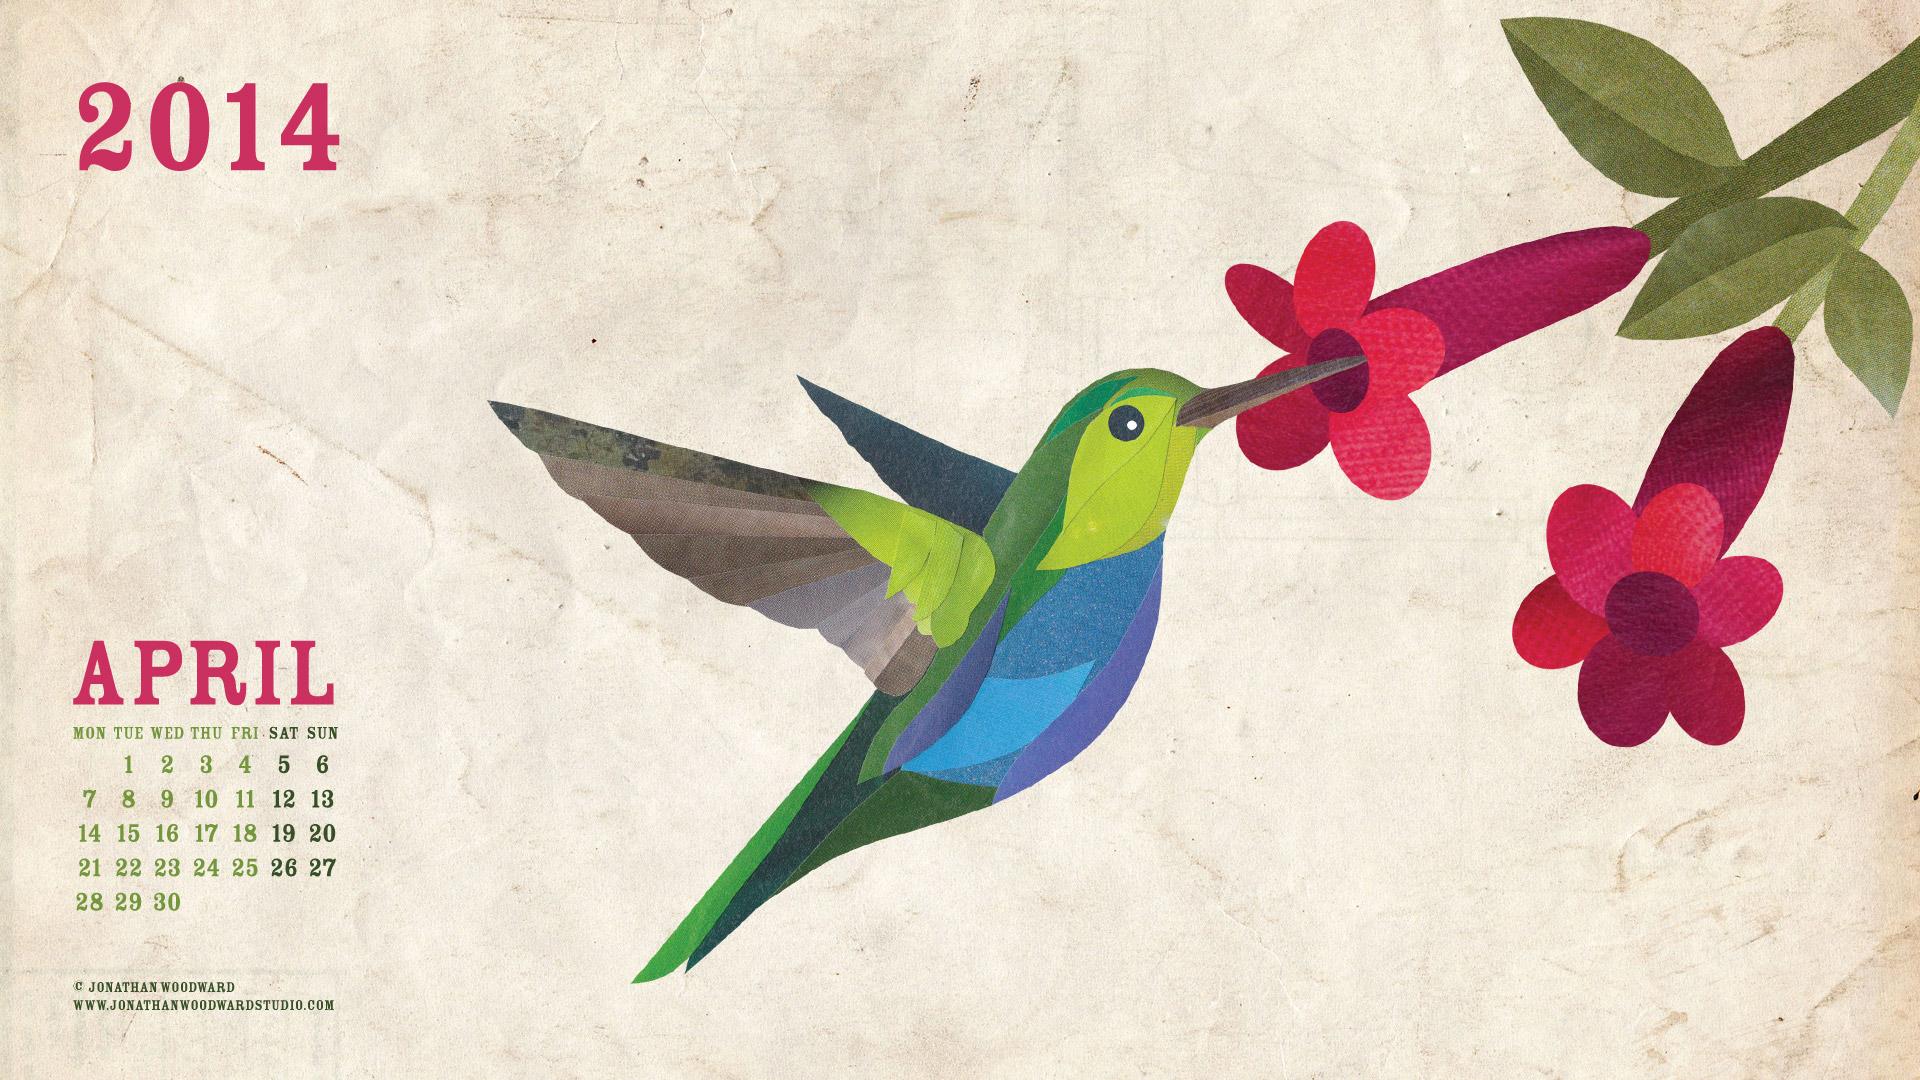 The April 2014 Desktop Wallpaper Jonathan Woodward Studio Wildlife 1920x1080